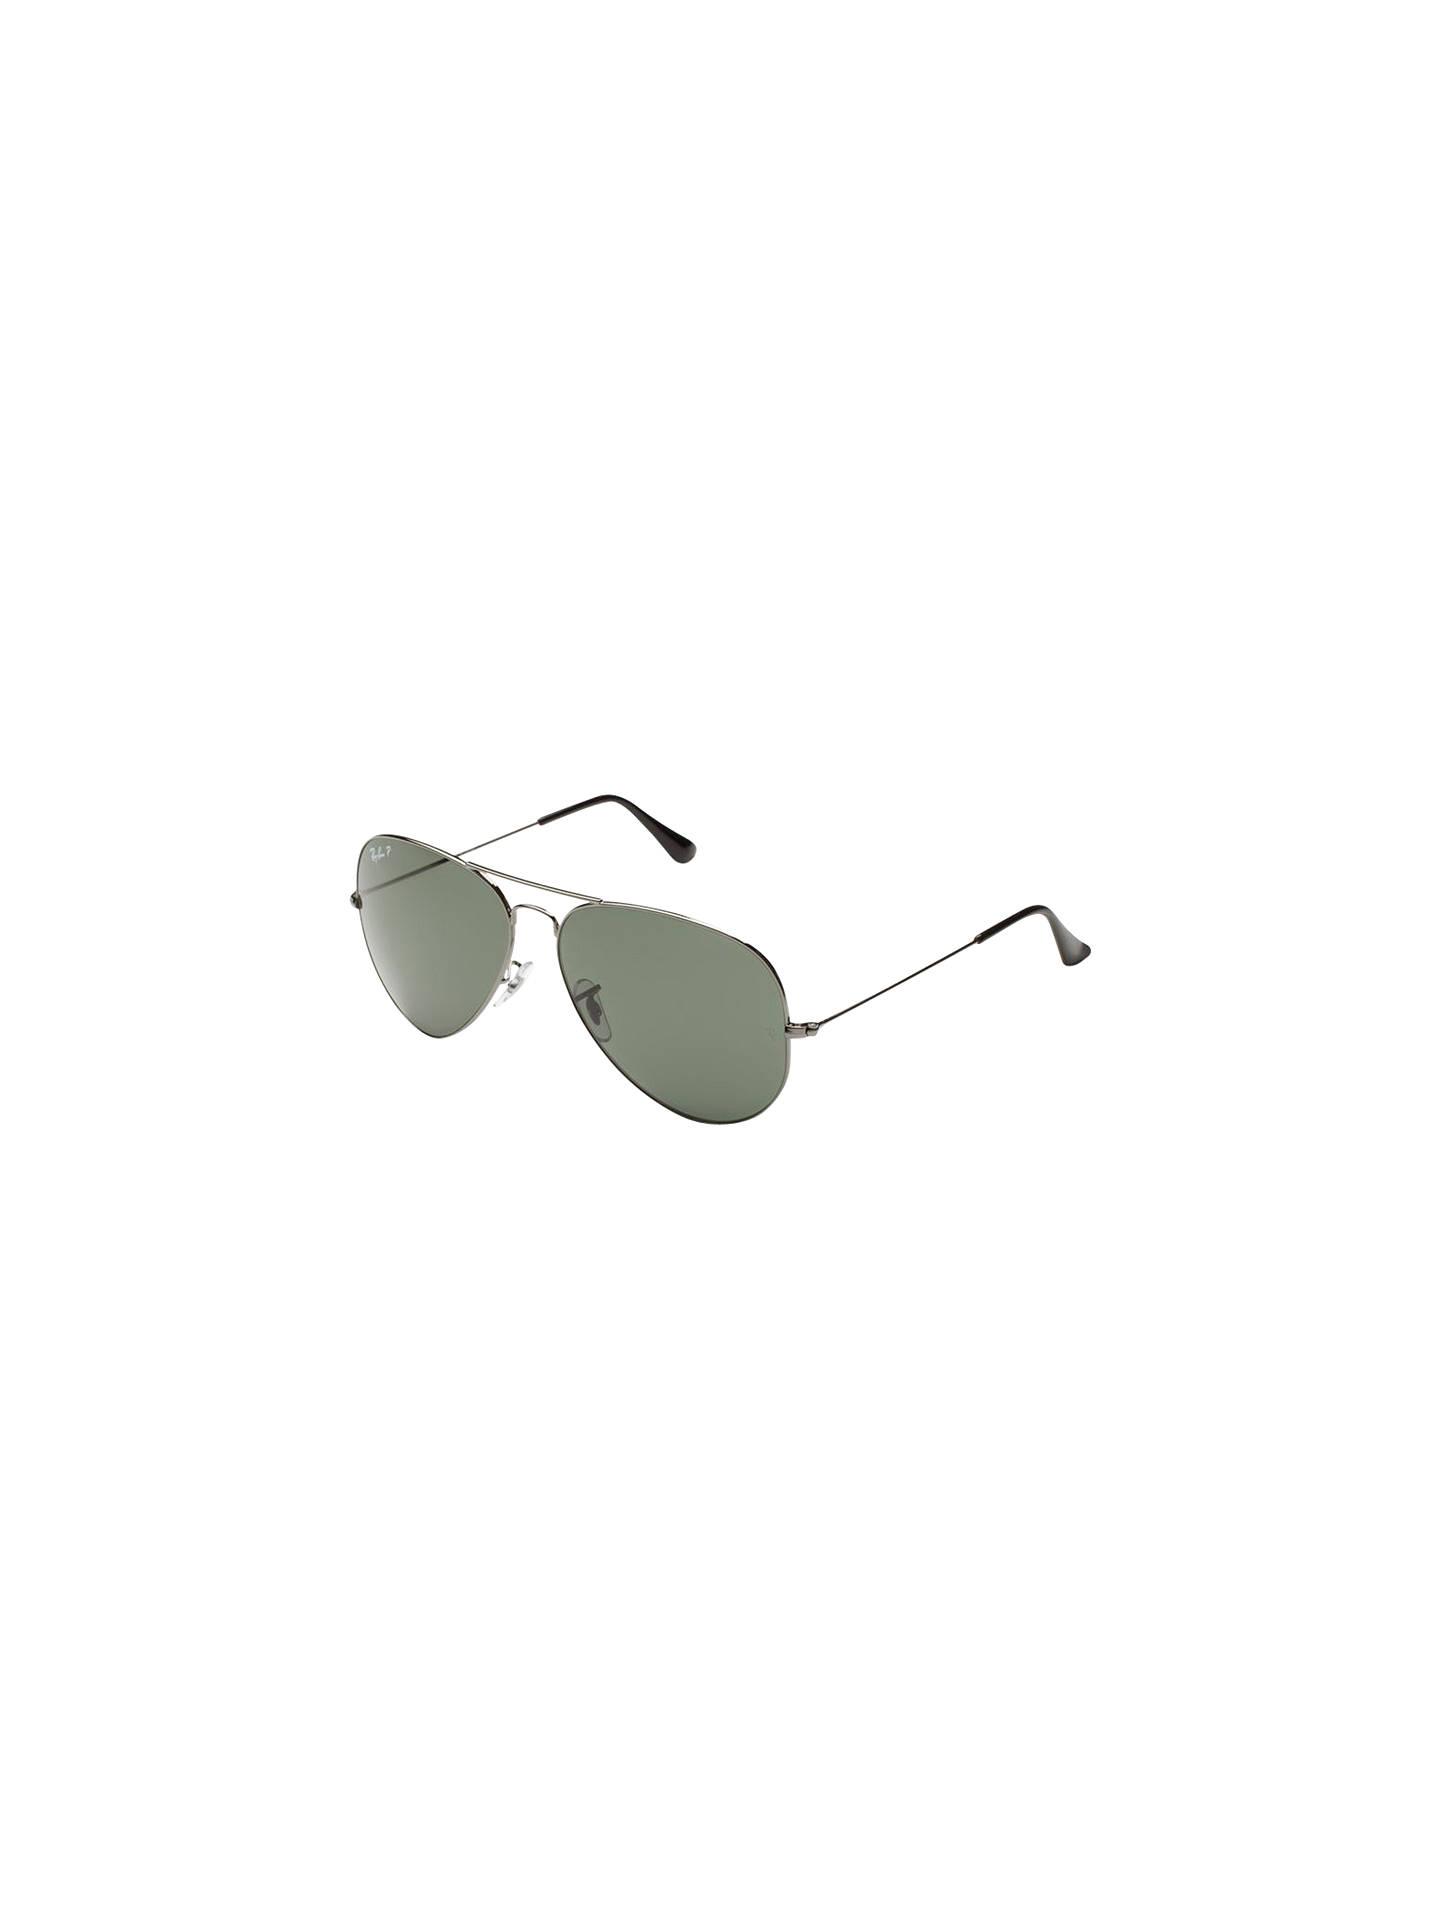 66948951d0f79 Ray-Ban RB3025 Polarised Aviator Sunglasses at John Lewis   Partners